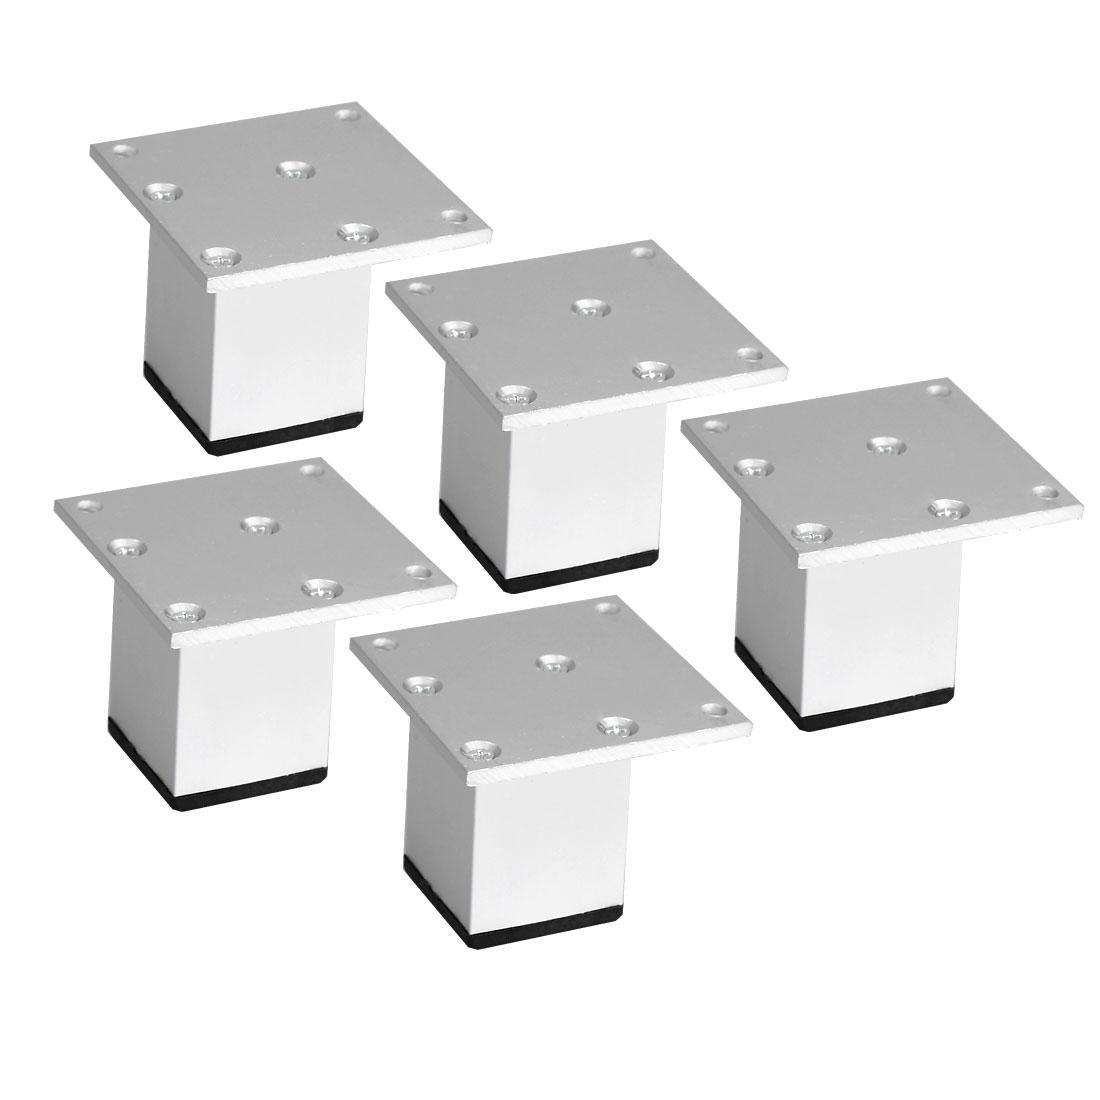 "2"" Furniture Legs Aluminium Alloy Table Feet Replacement Height Adjuster 5pcs"